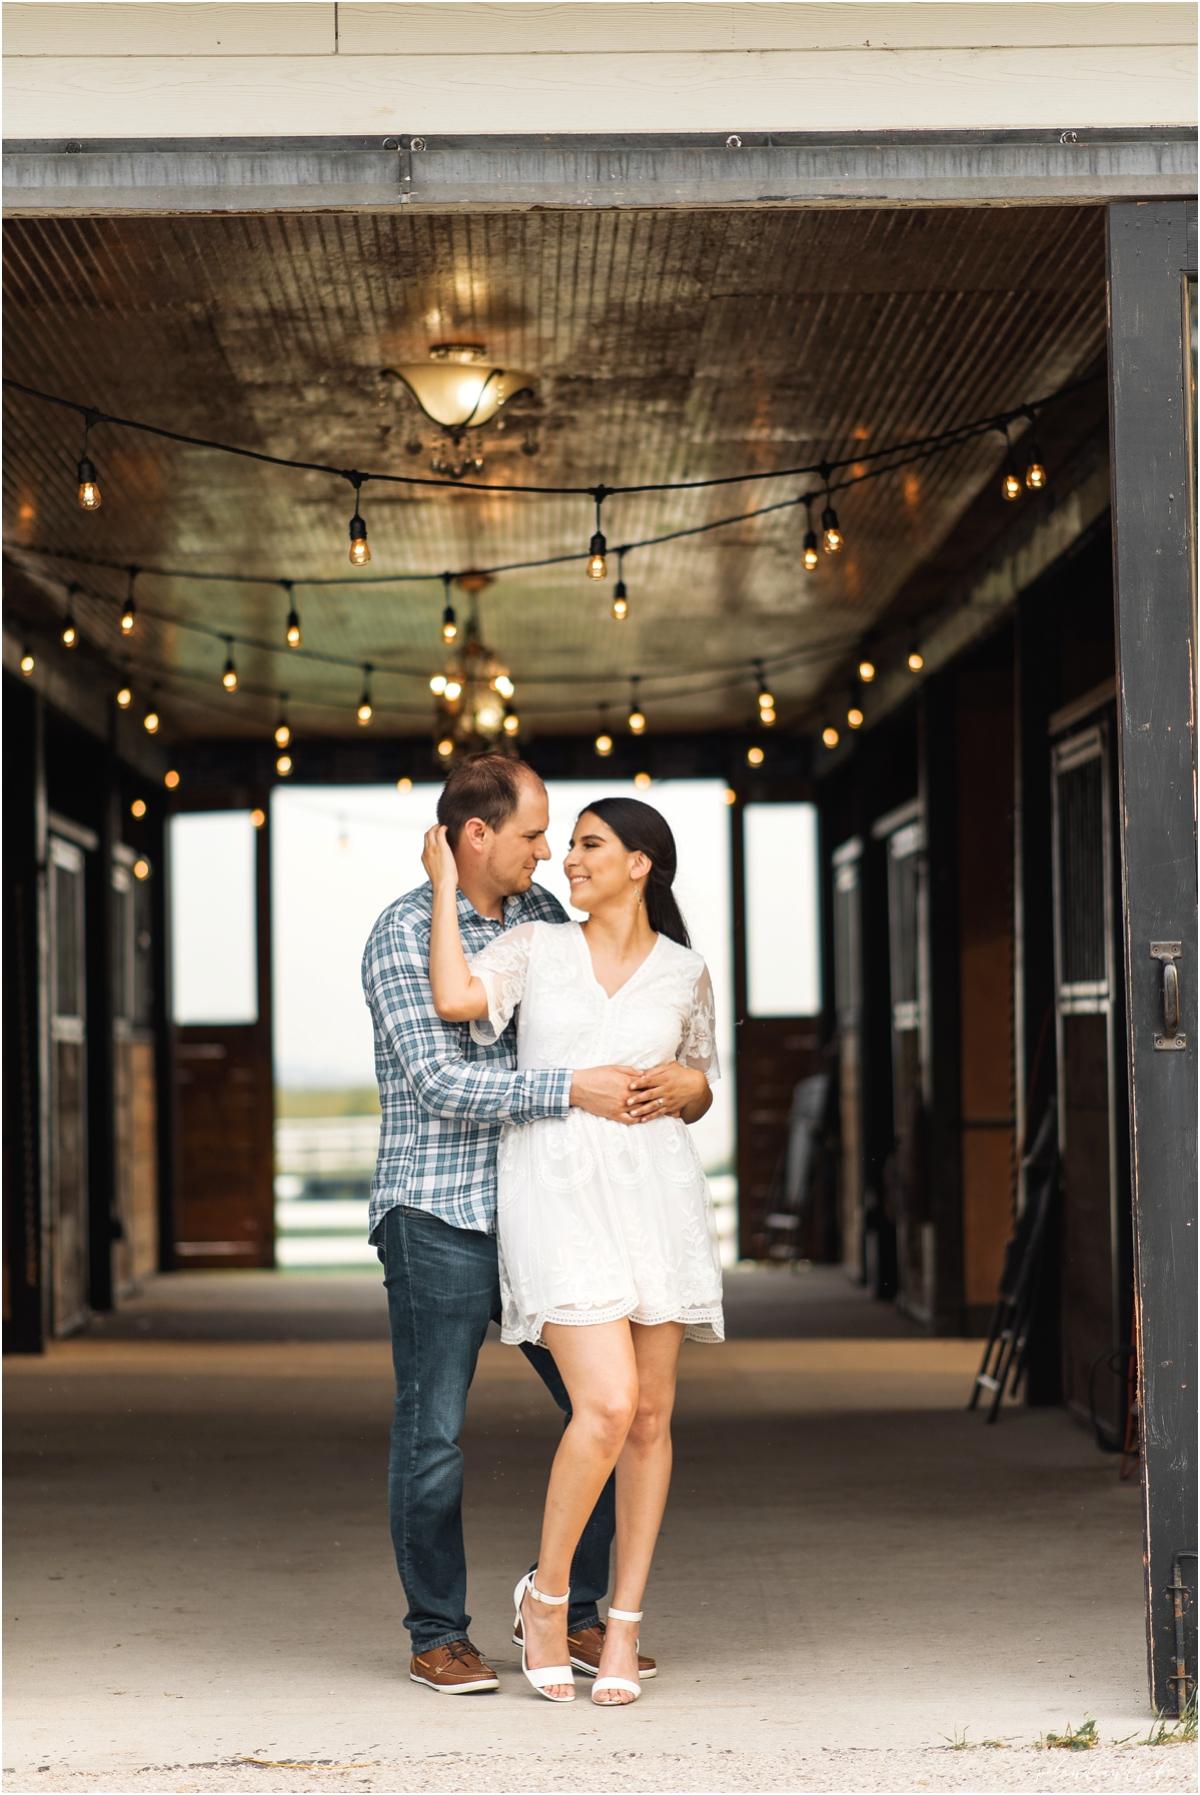 Yesenia + Daniel Northfork Farm Engagement Session Oswego Wedding Photographer Aurora Wedding Photographer17.jpg